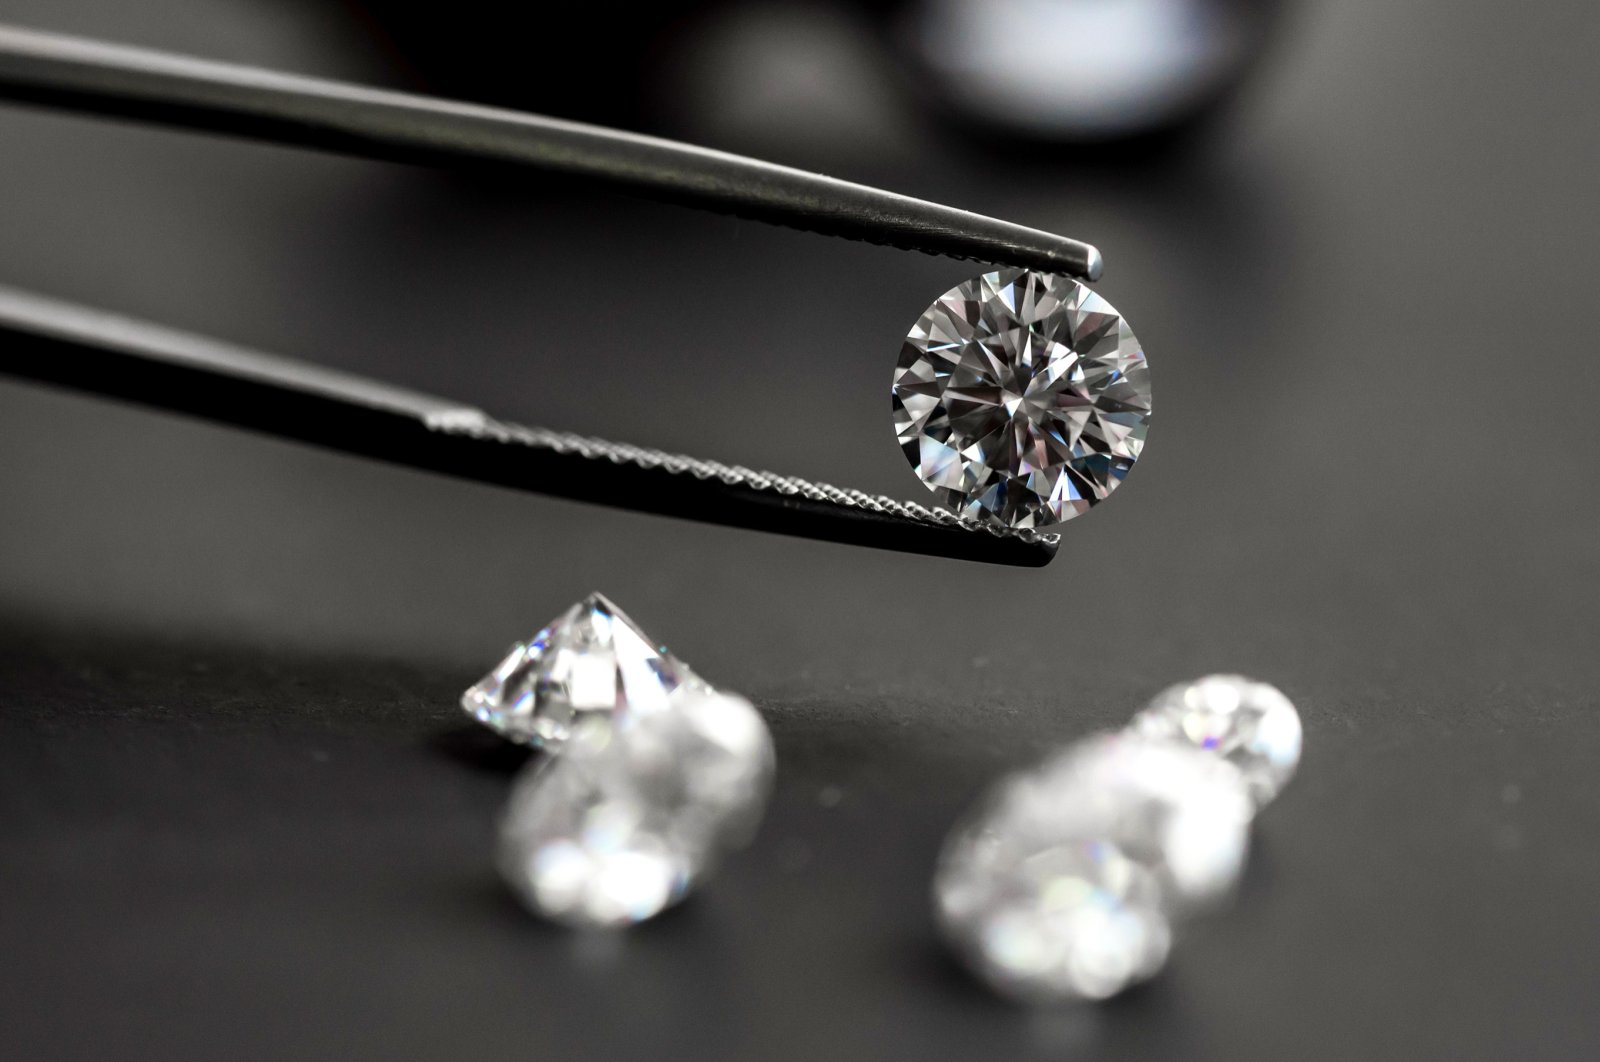 A diamond sparkles as it's held up in tweezers. (Shutterstock Photo)